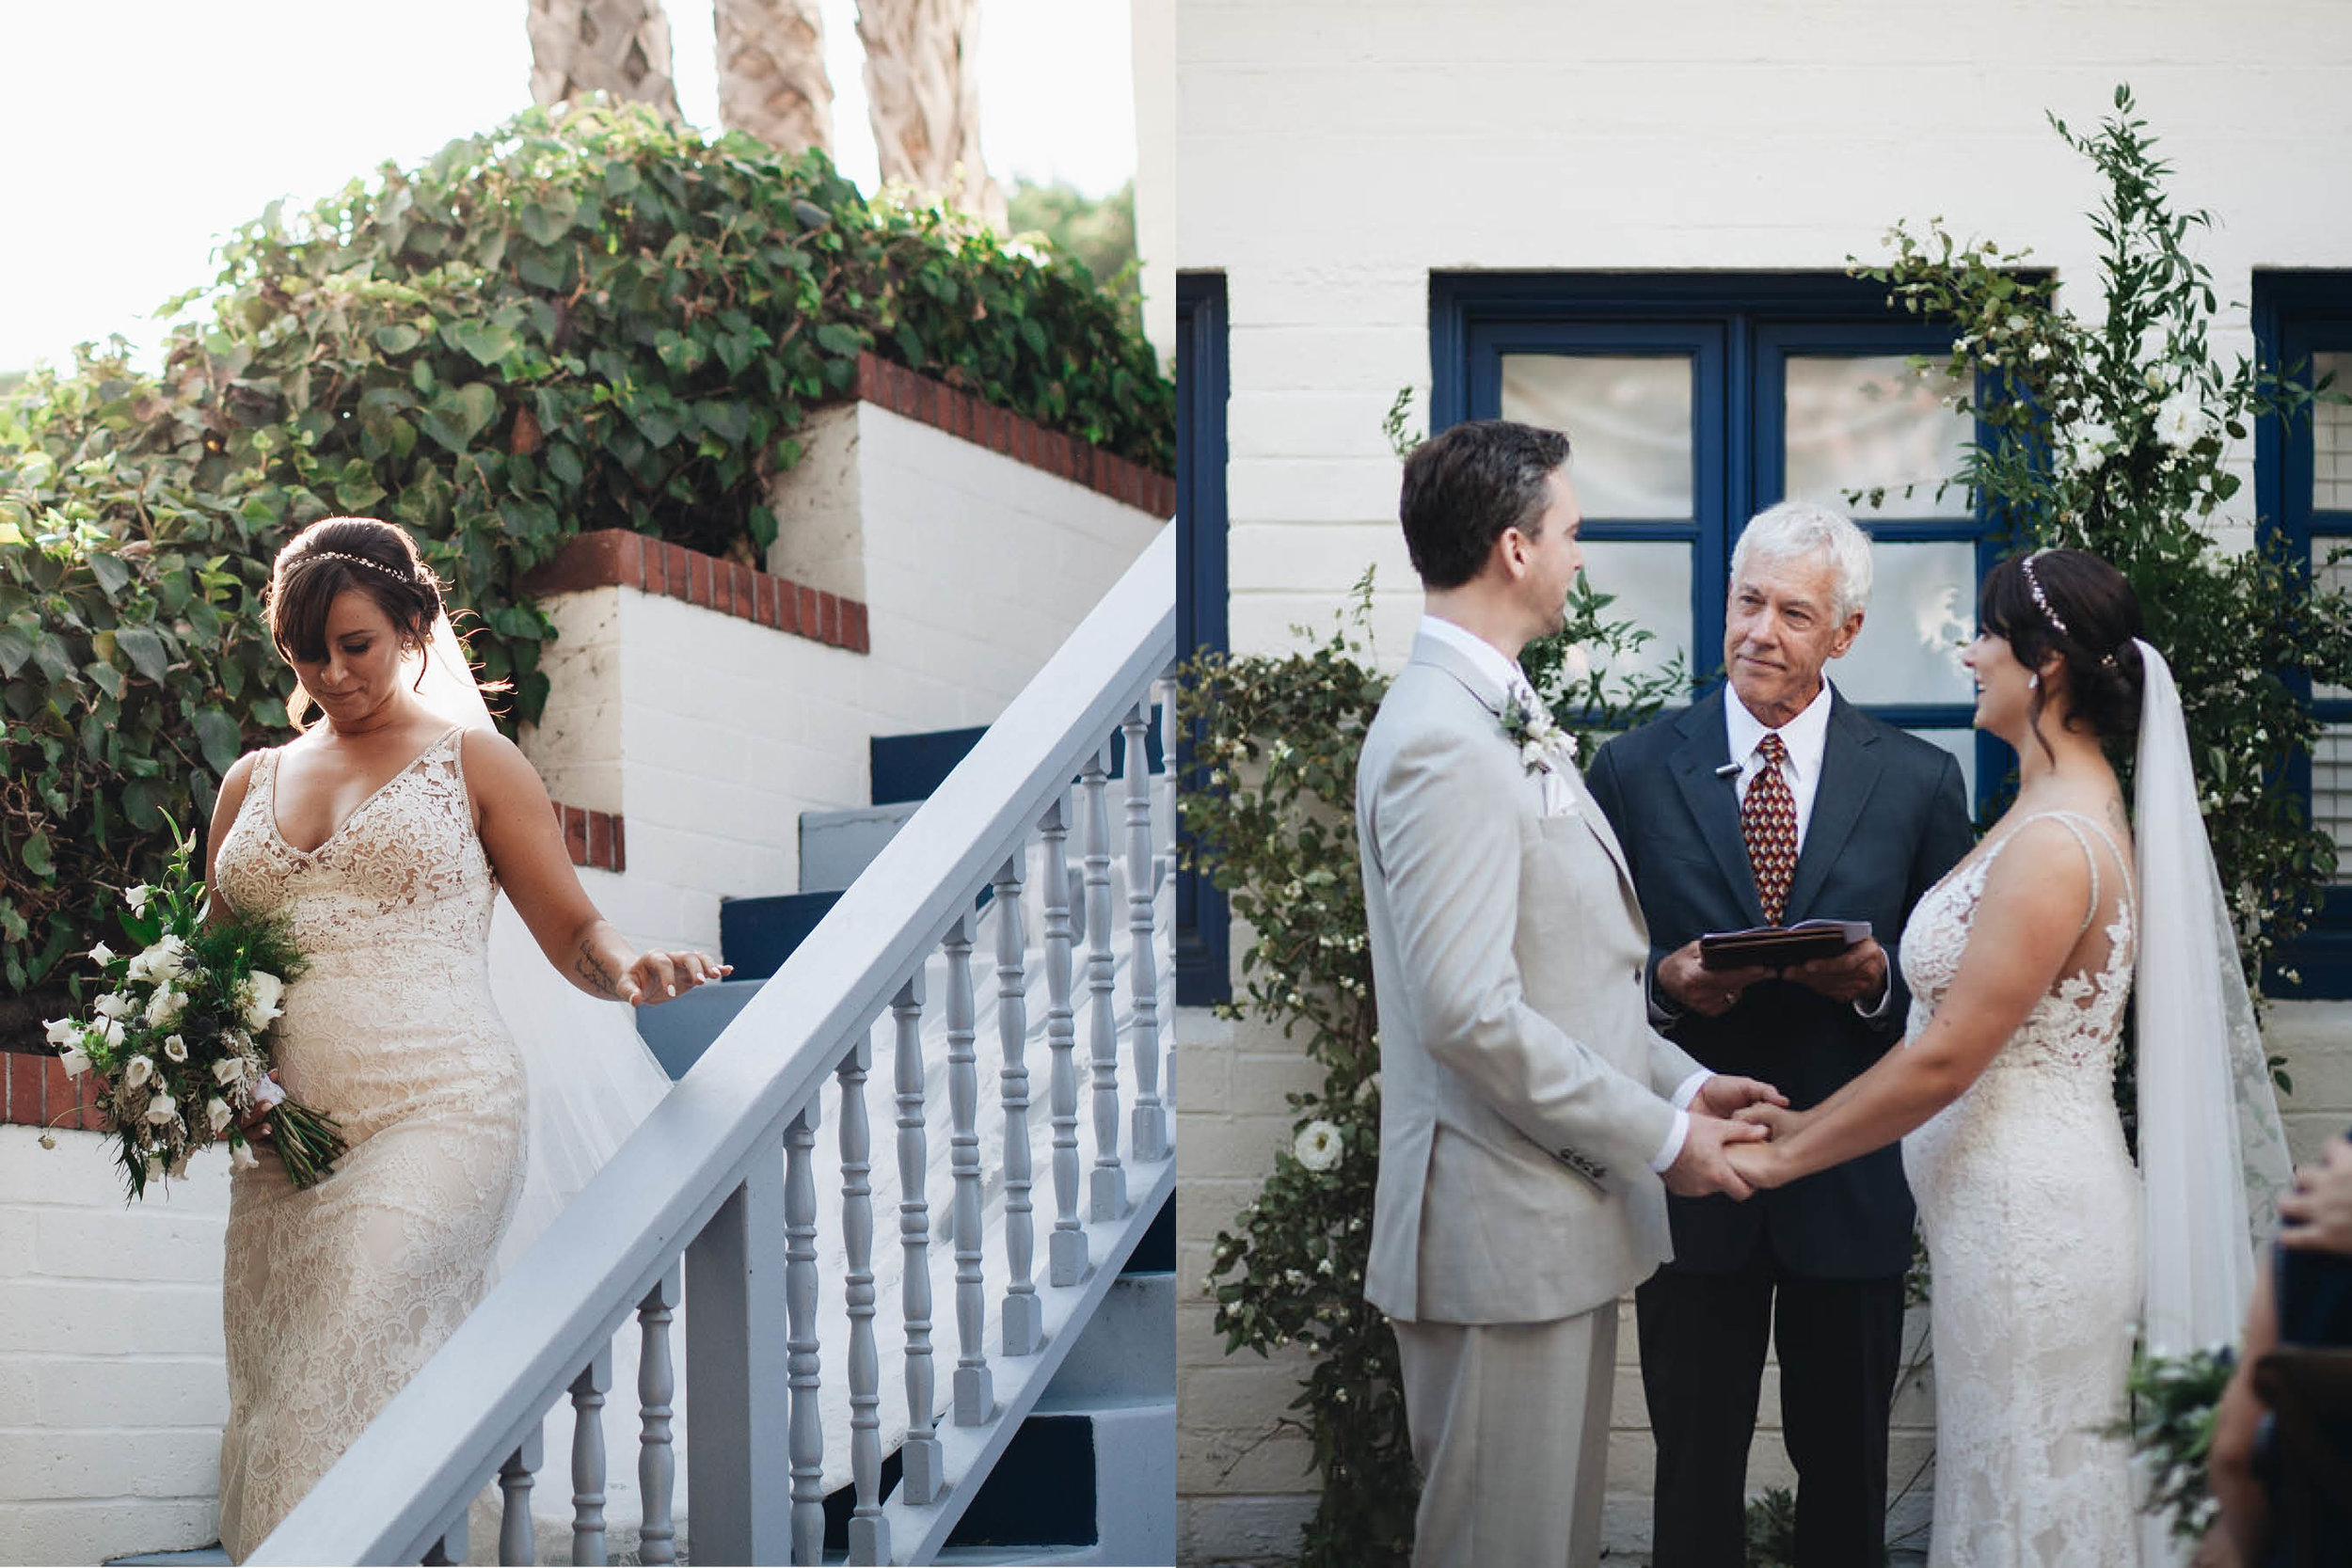 santa-barbara-elopement-wedding-planner-planning-coordination-day-of-coordinator-downtown-garden-oasis-float-spa-fountain-blue-white-event-design-vintage-china (16).jpg